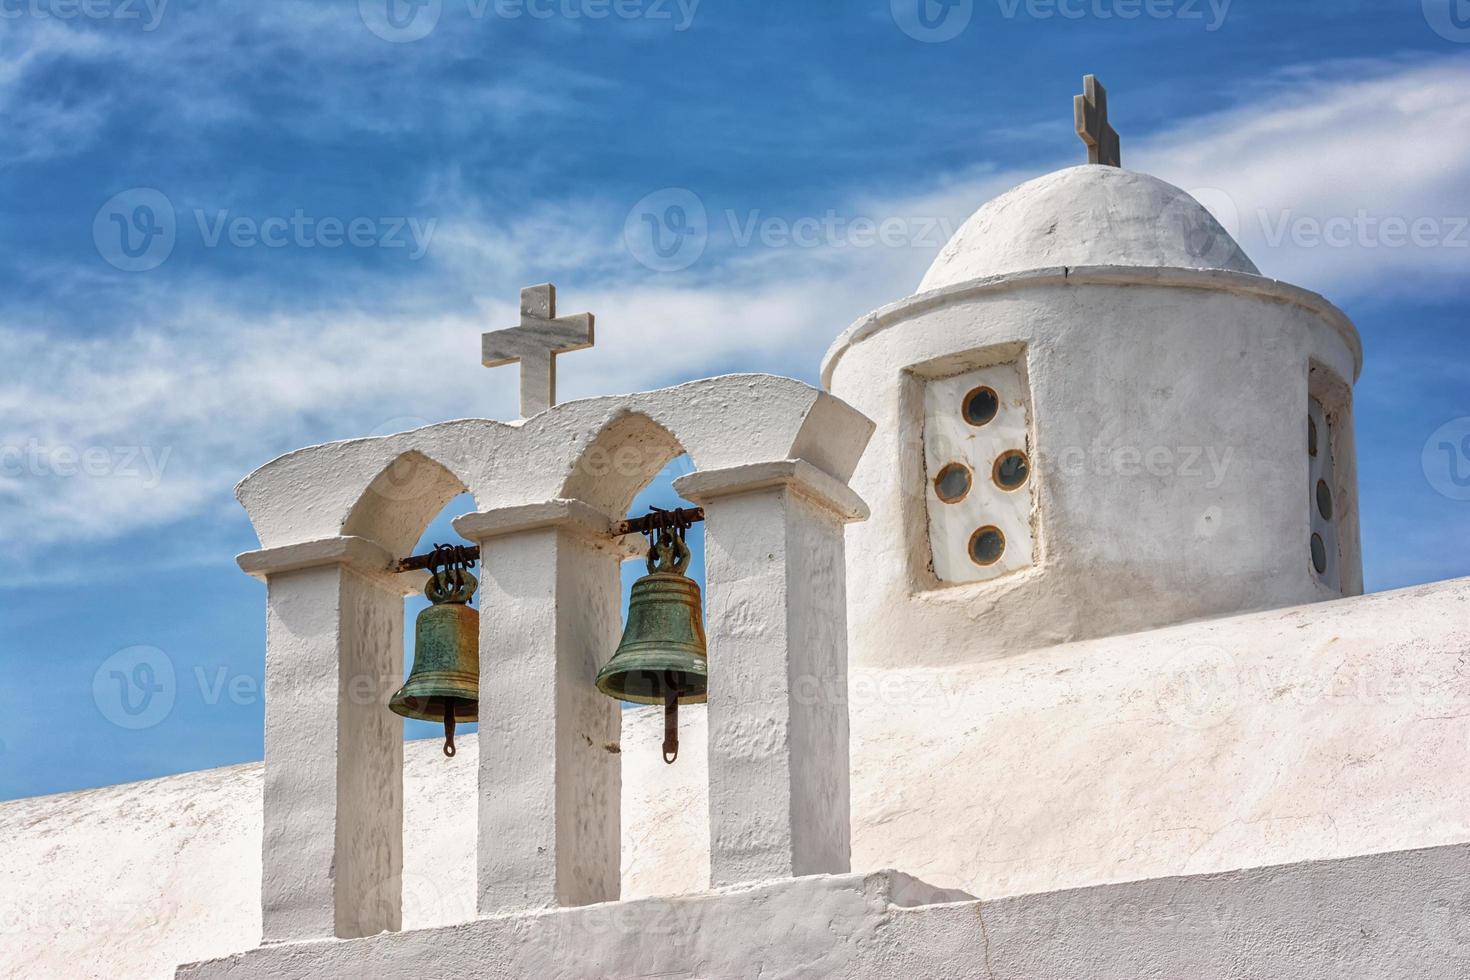 Iglesia de panagia thalassitra, isla de milos, grecia foto